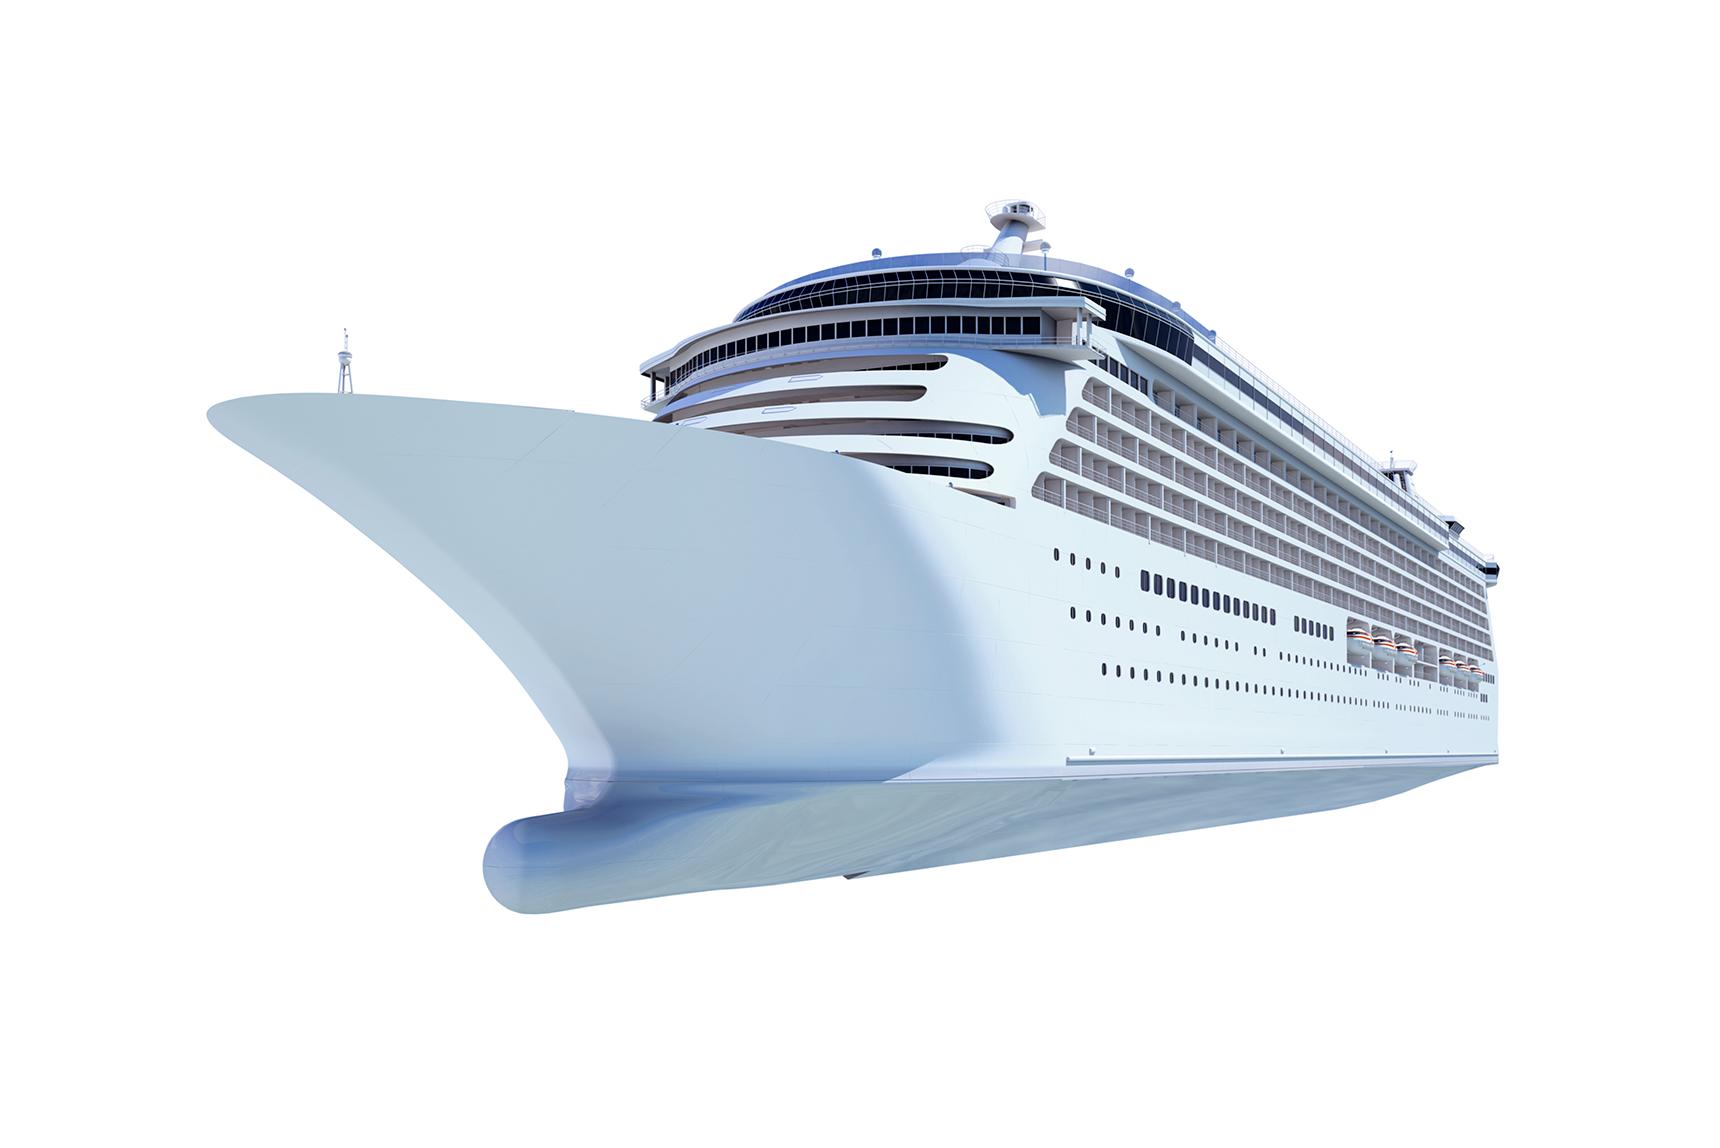 Royal Caribbean case study: how global customer segmentations fueled growth strategy.